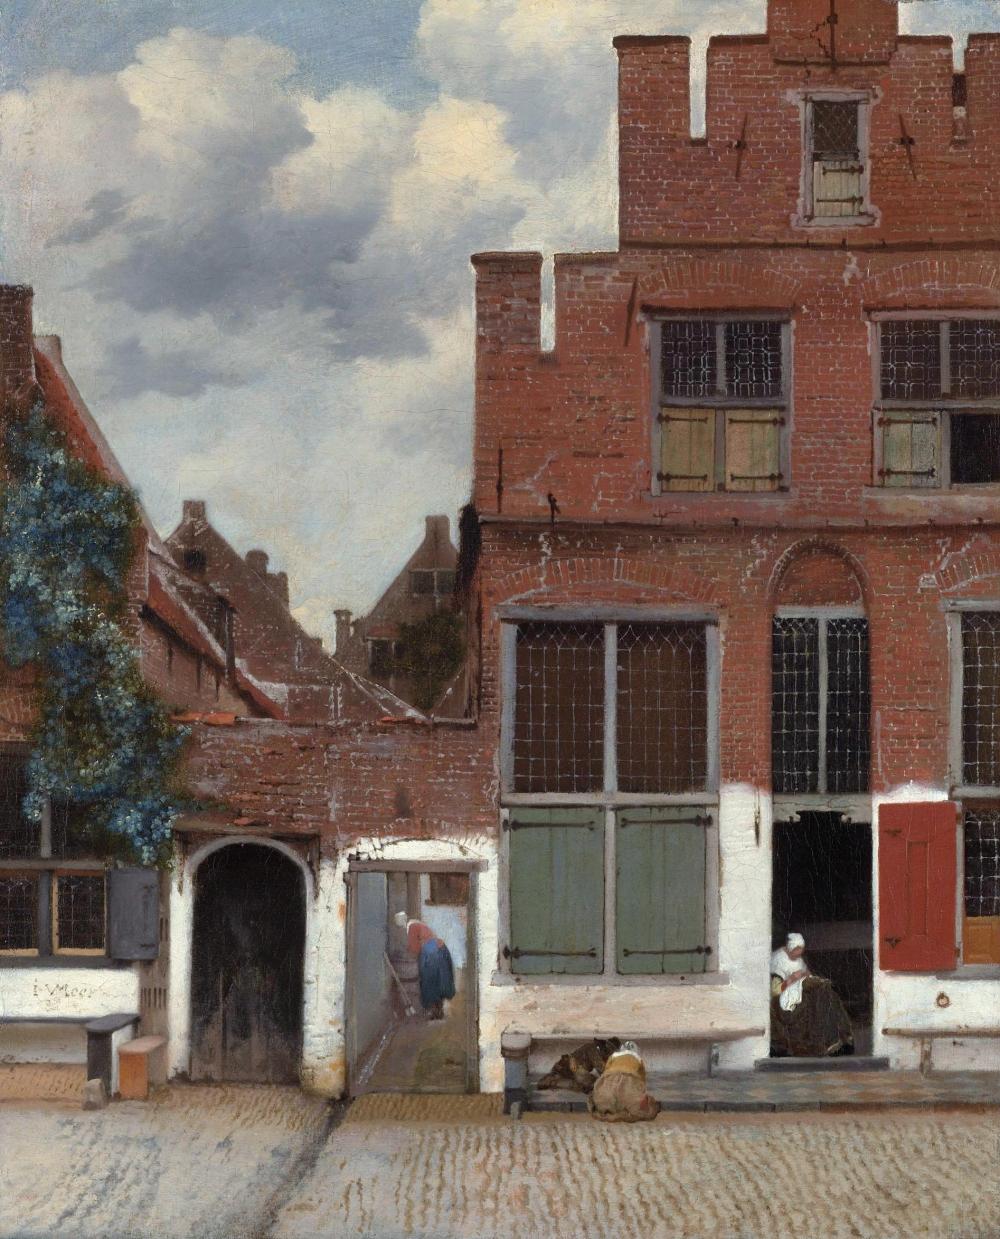 Johannes Vermeer. La callejuela. Hacia 1657-1658. Rijkmuseum. Ámsterdam.